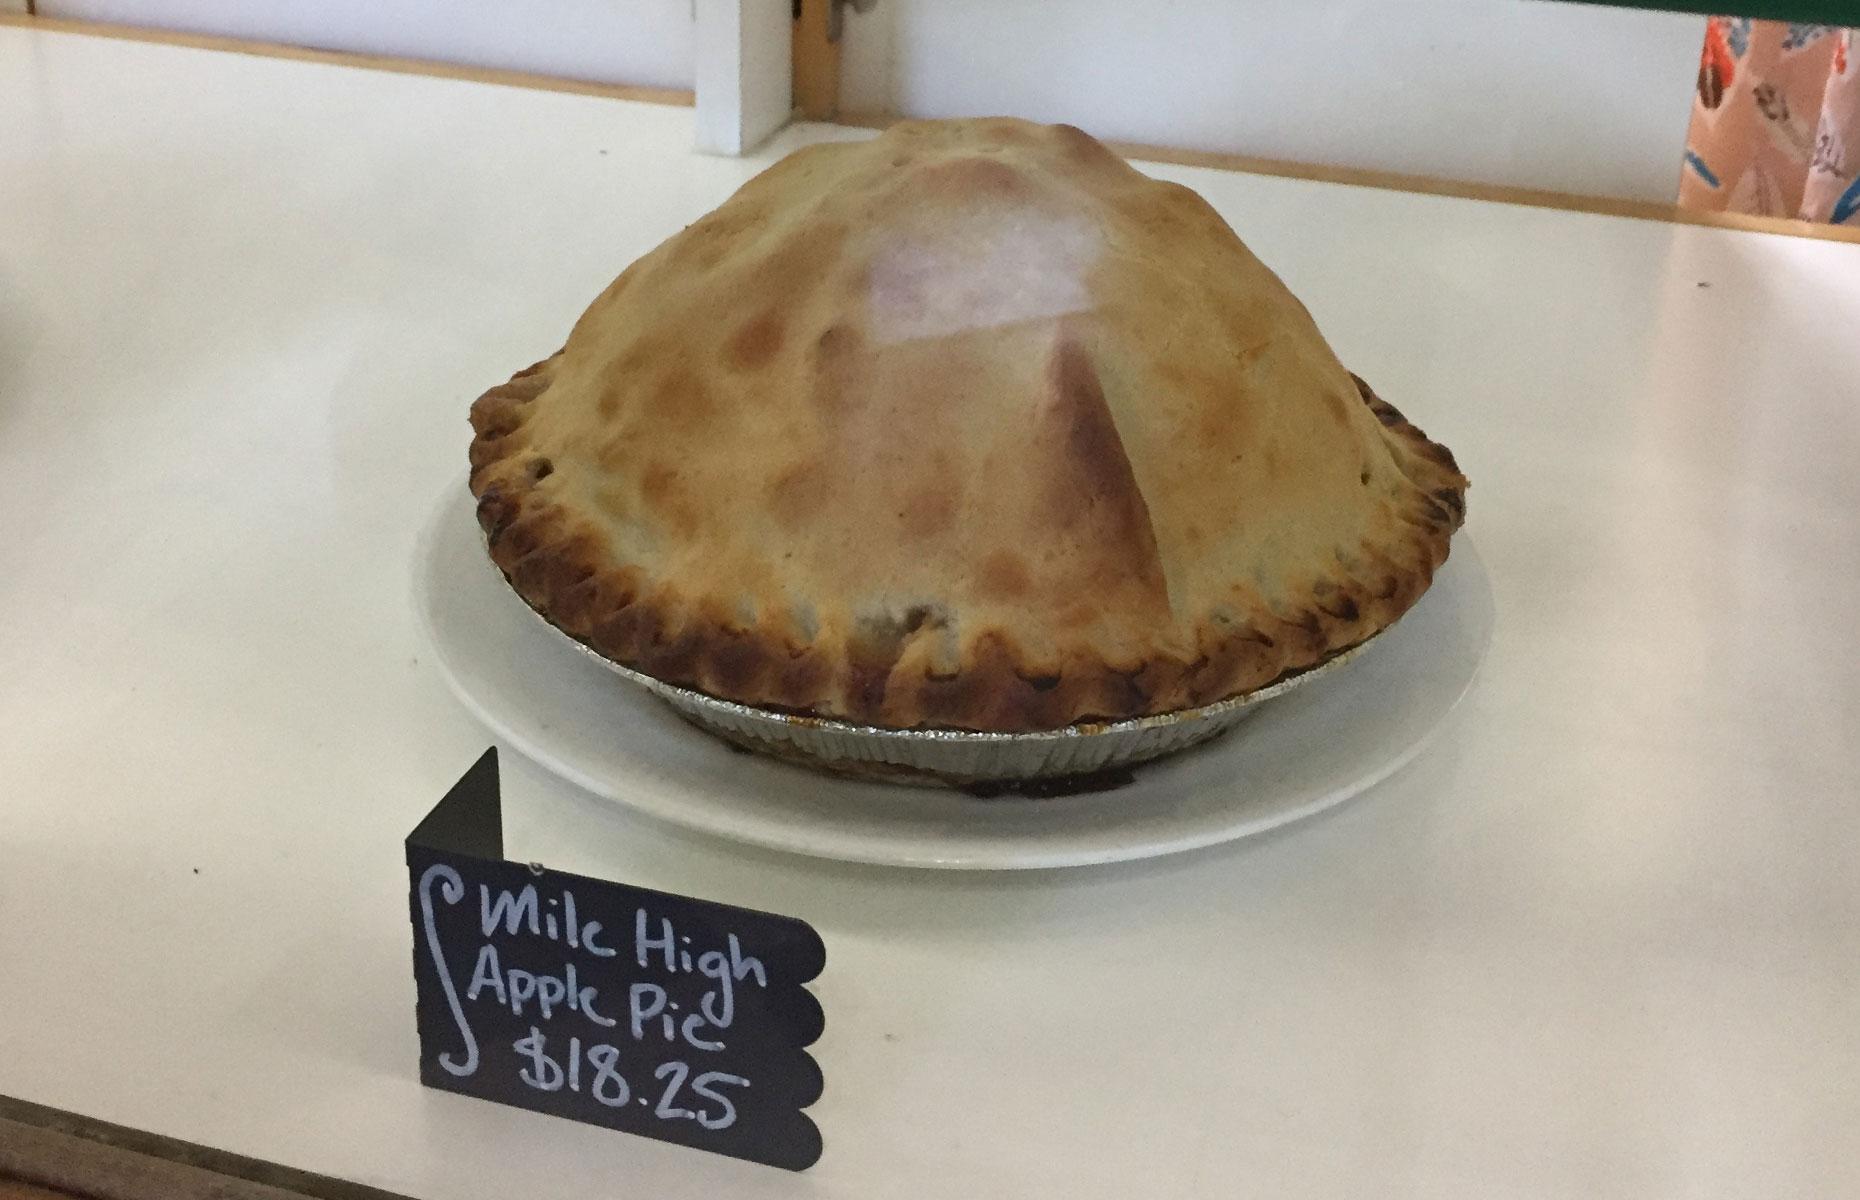 Mile High Apple Pie (Image: Natalie Davies)